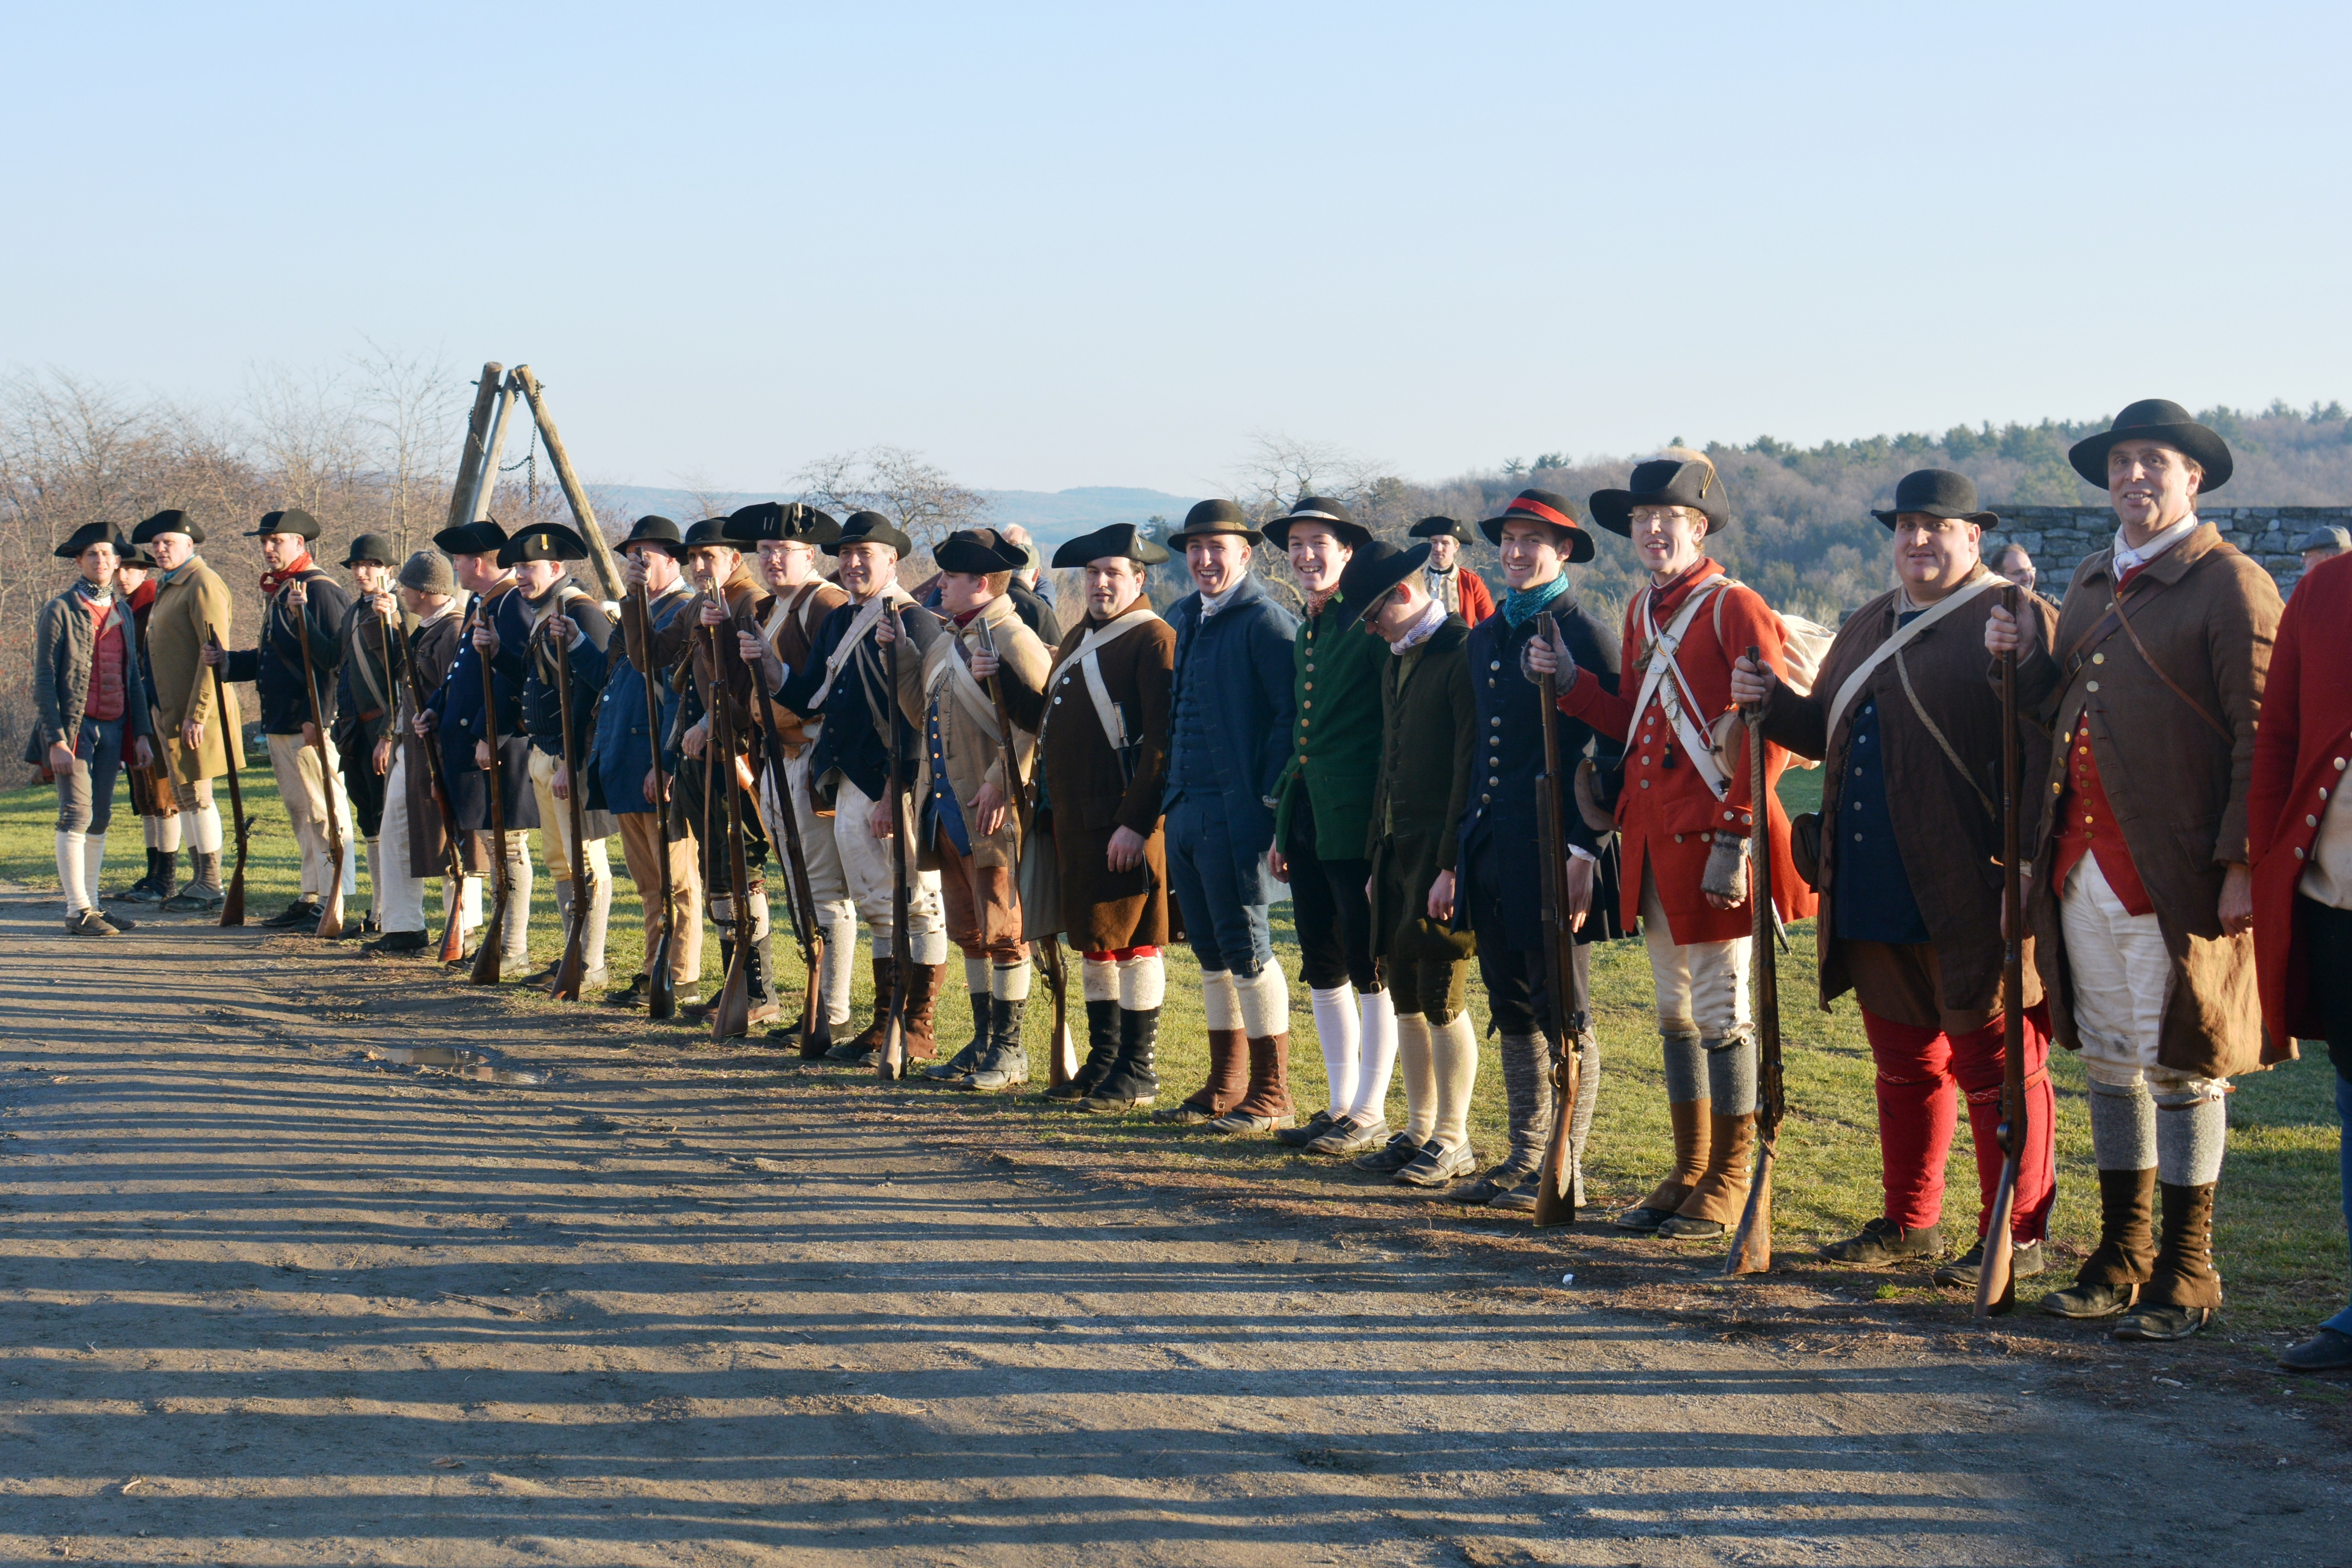 re-enactors lined up